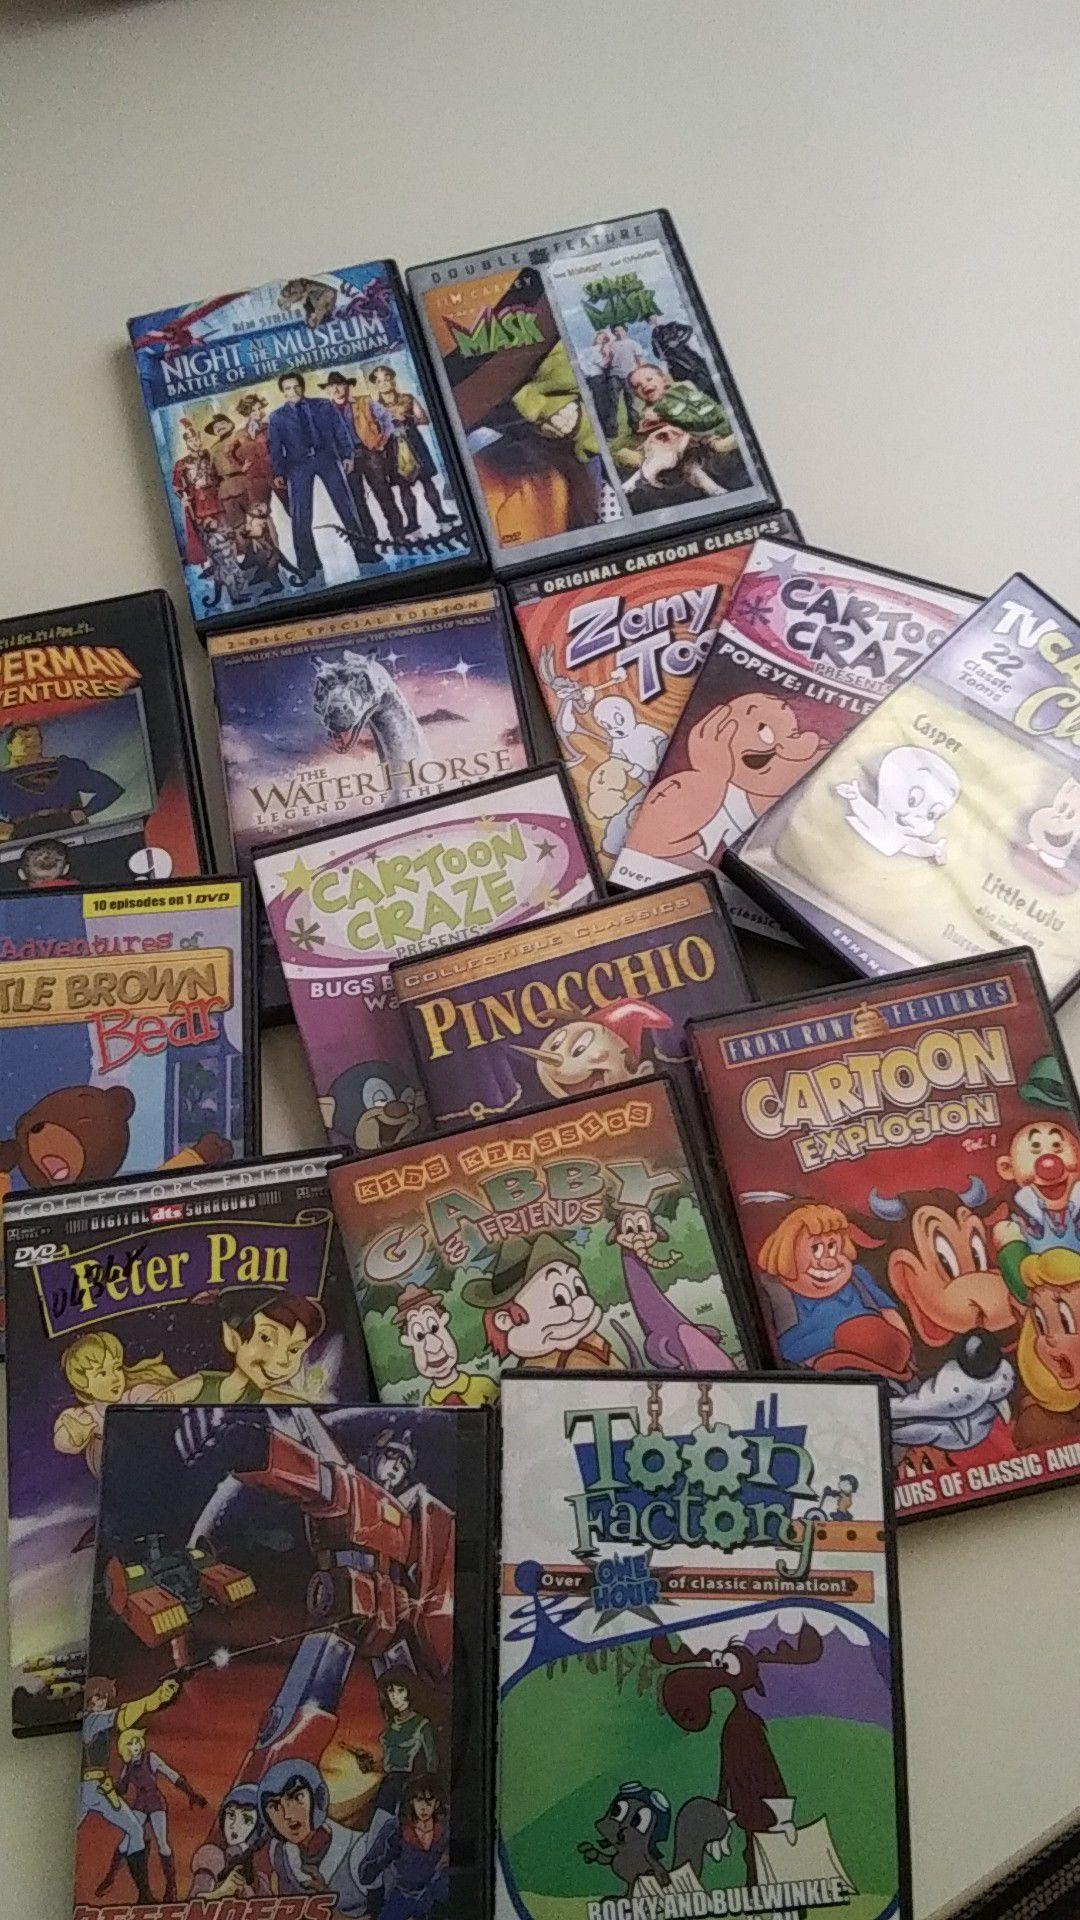 15 Children's assorted DVD movies